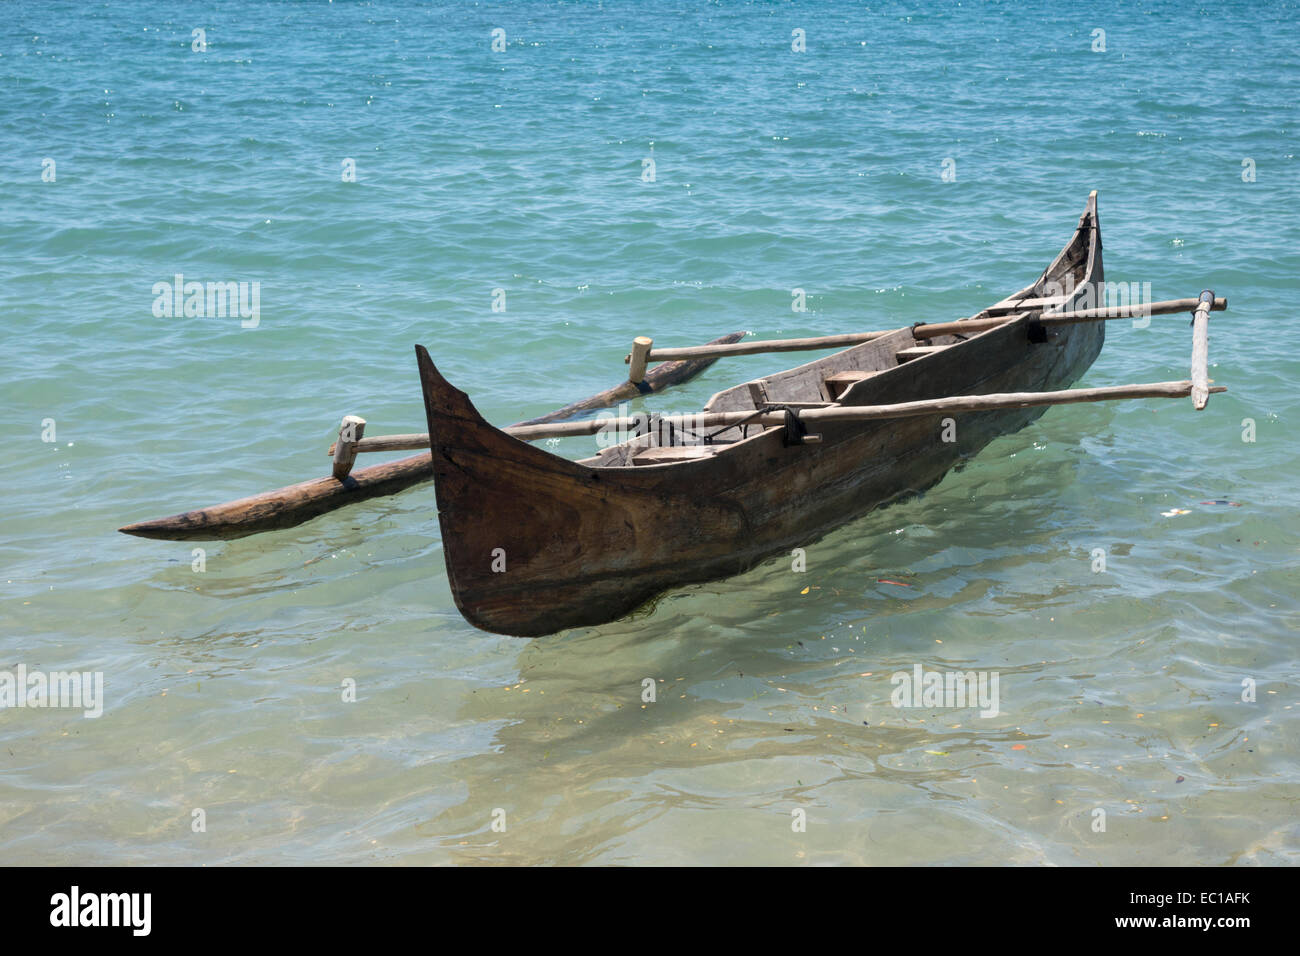 C Lion Outrigger Canoe Dugout canoe with outr...